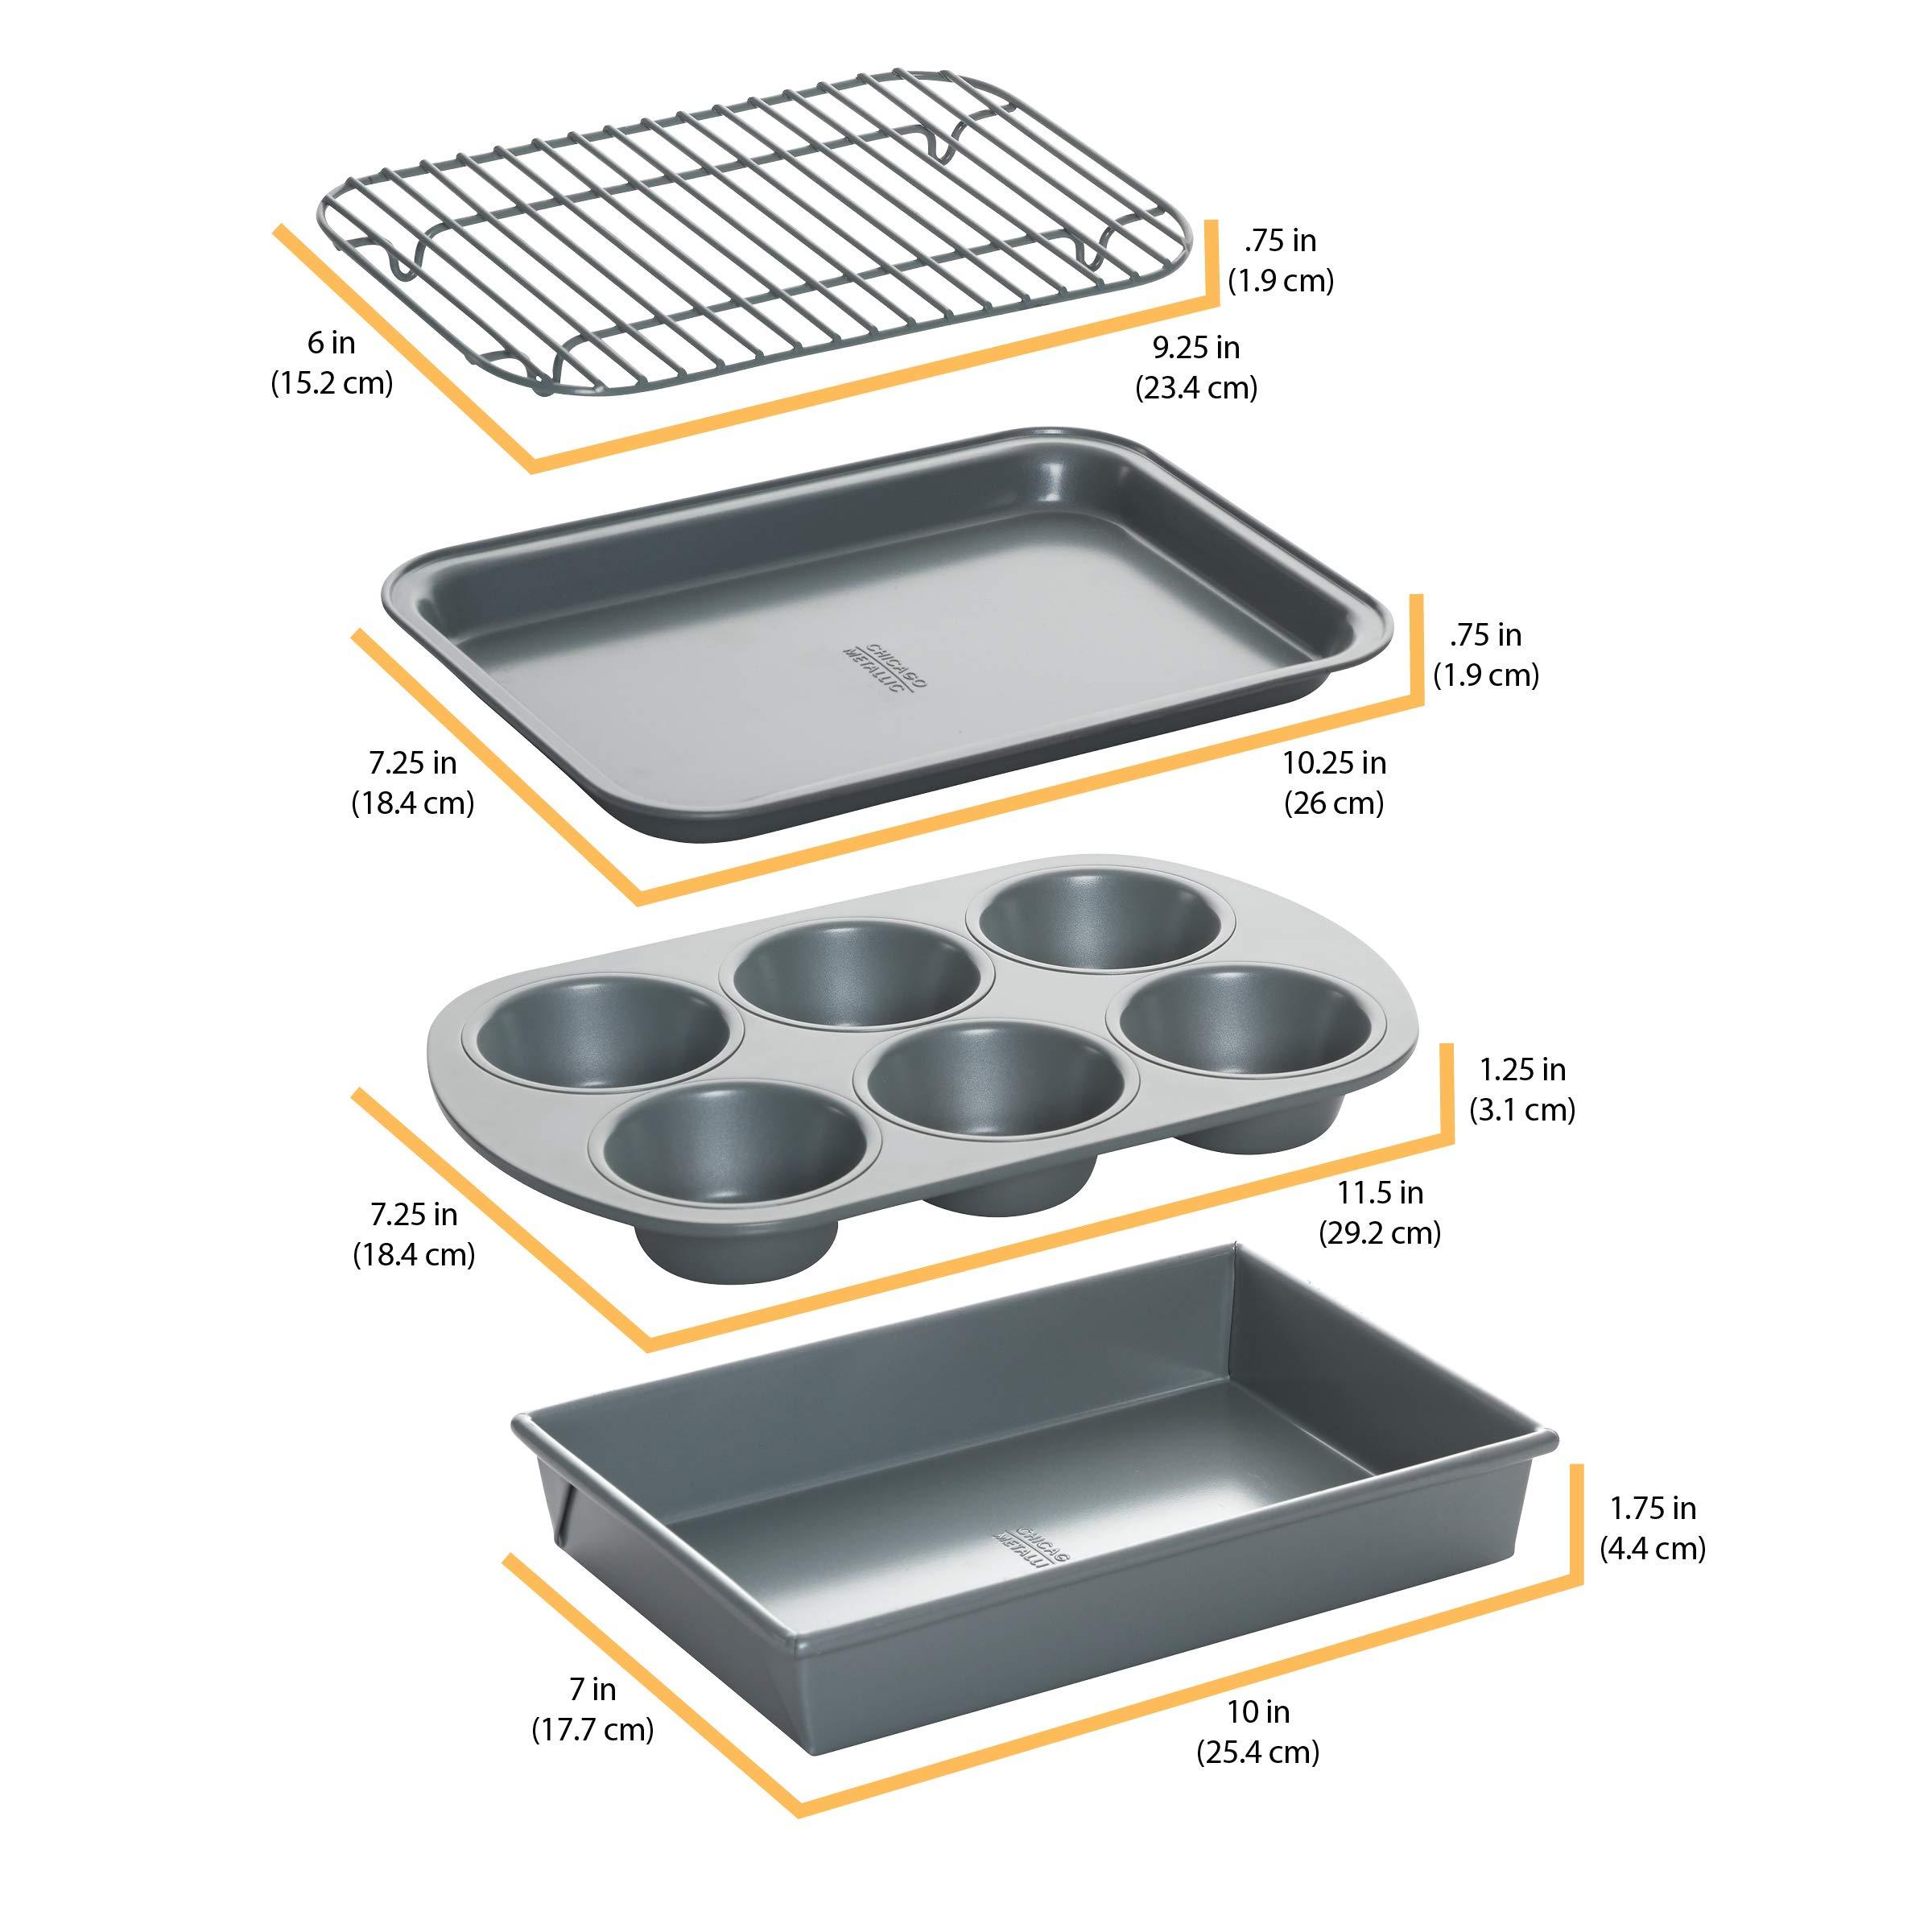 Chicago Metallic 8044 Non-Stick 4-Piece Toaster Oven Bakeware Set Set of 1 by Chicago Metallic (Image #4)